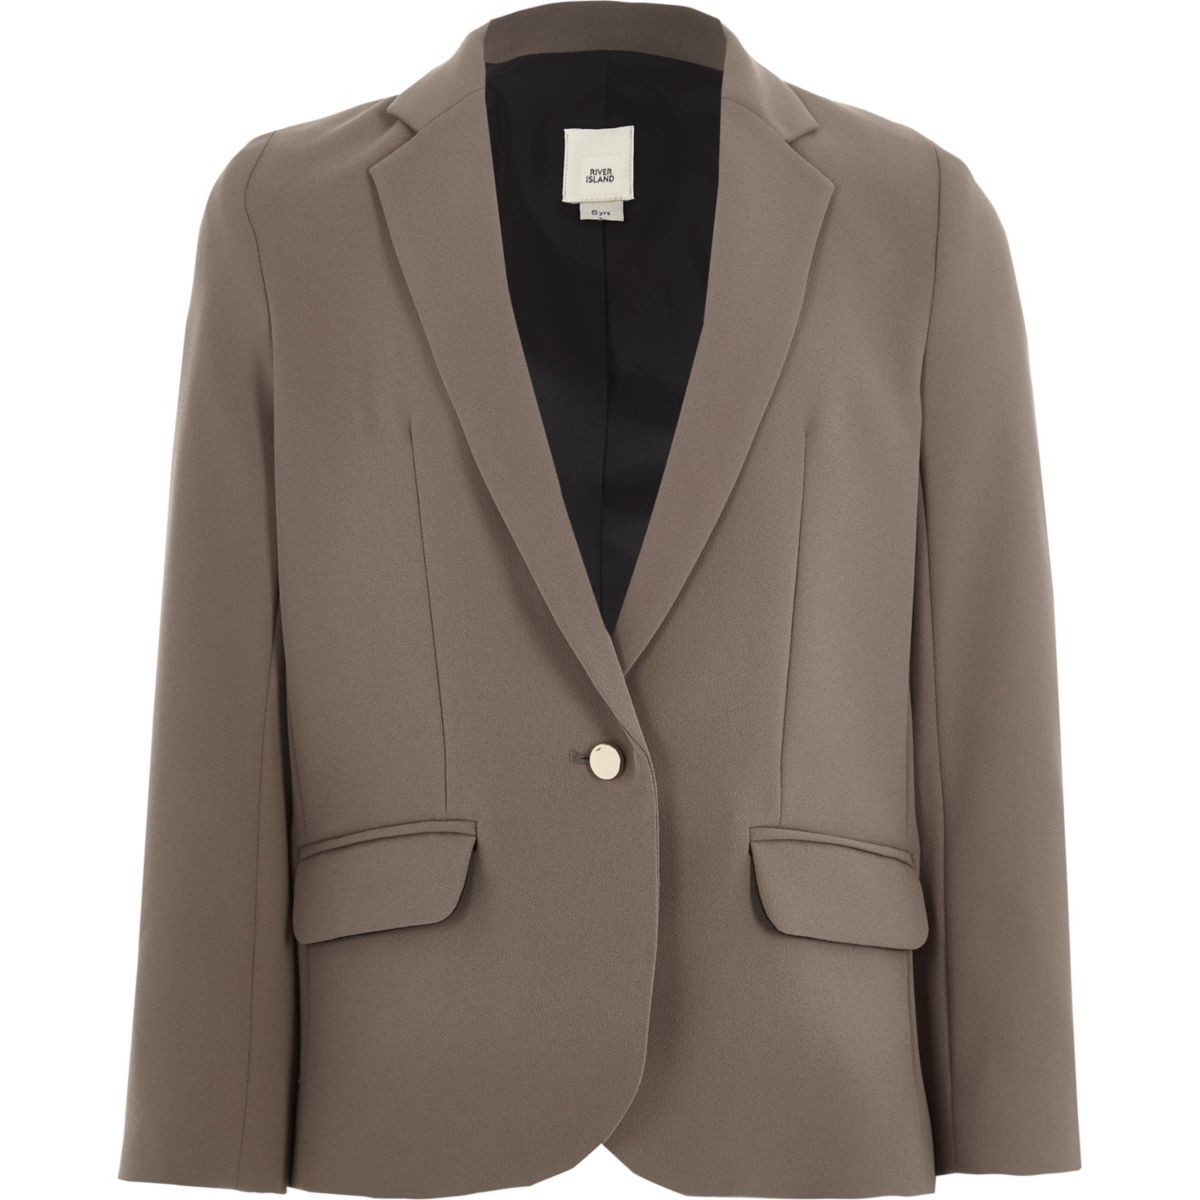 Girls mink grey blazer